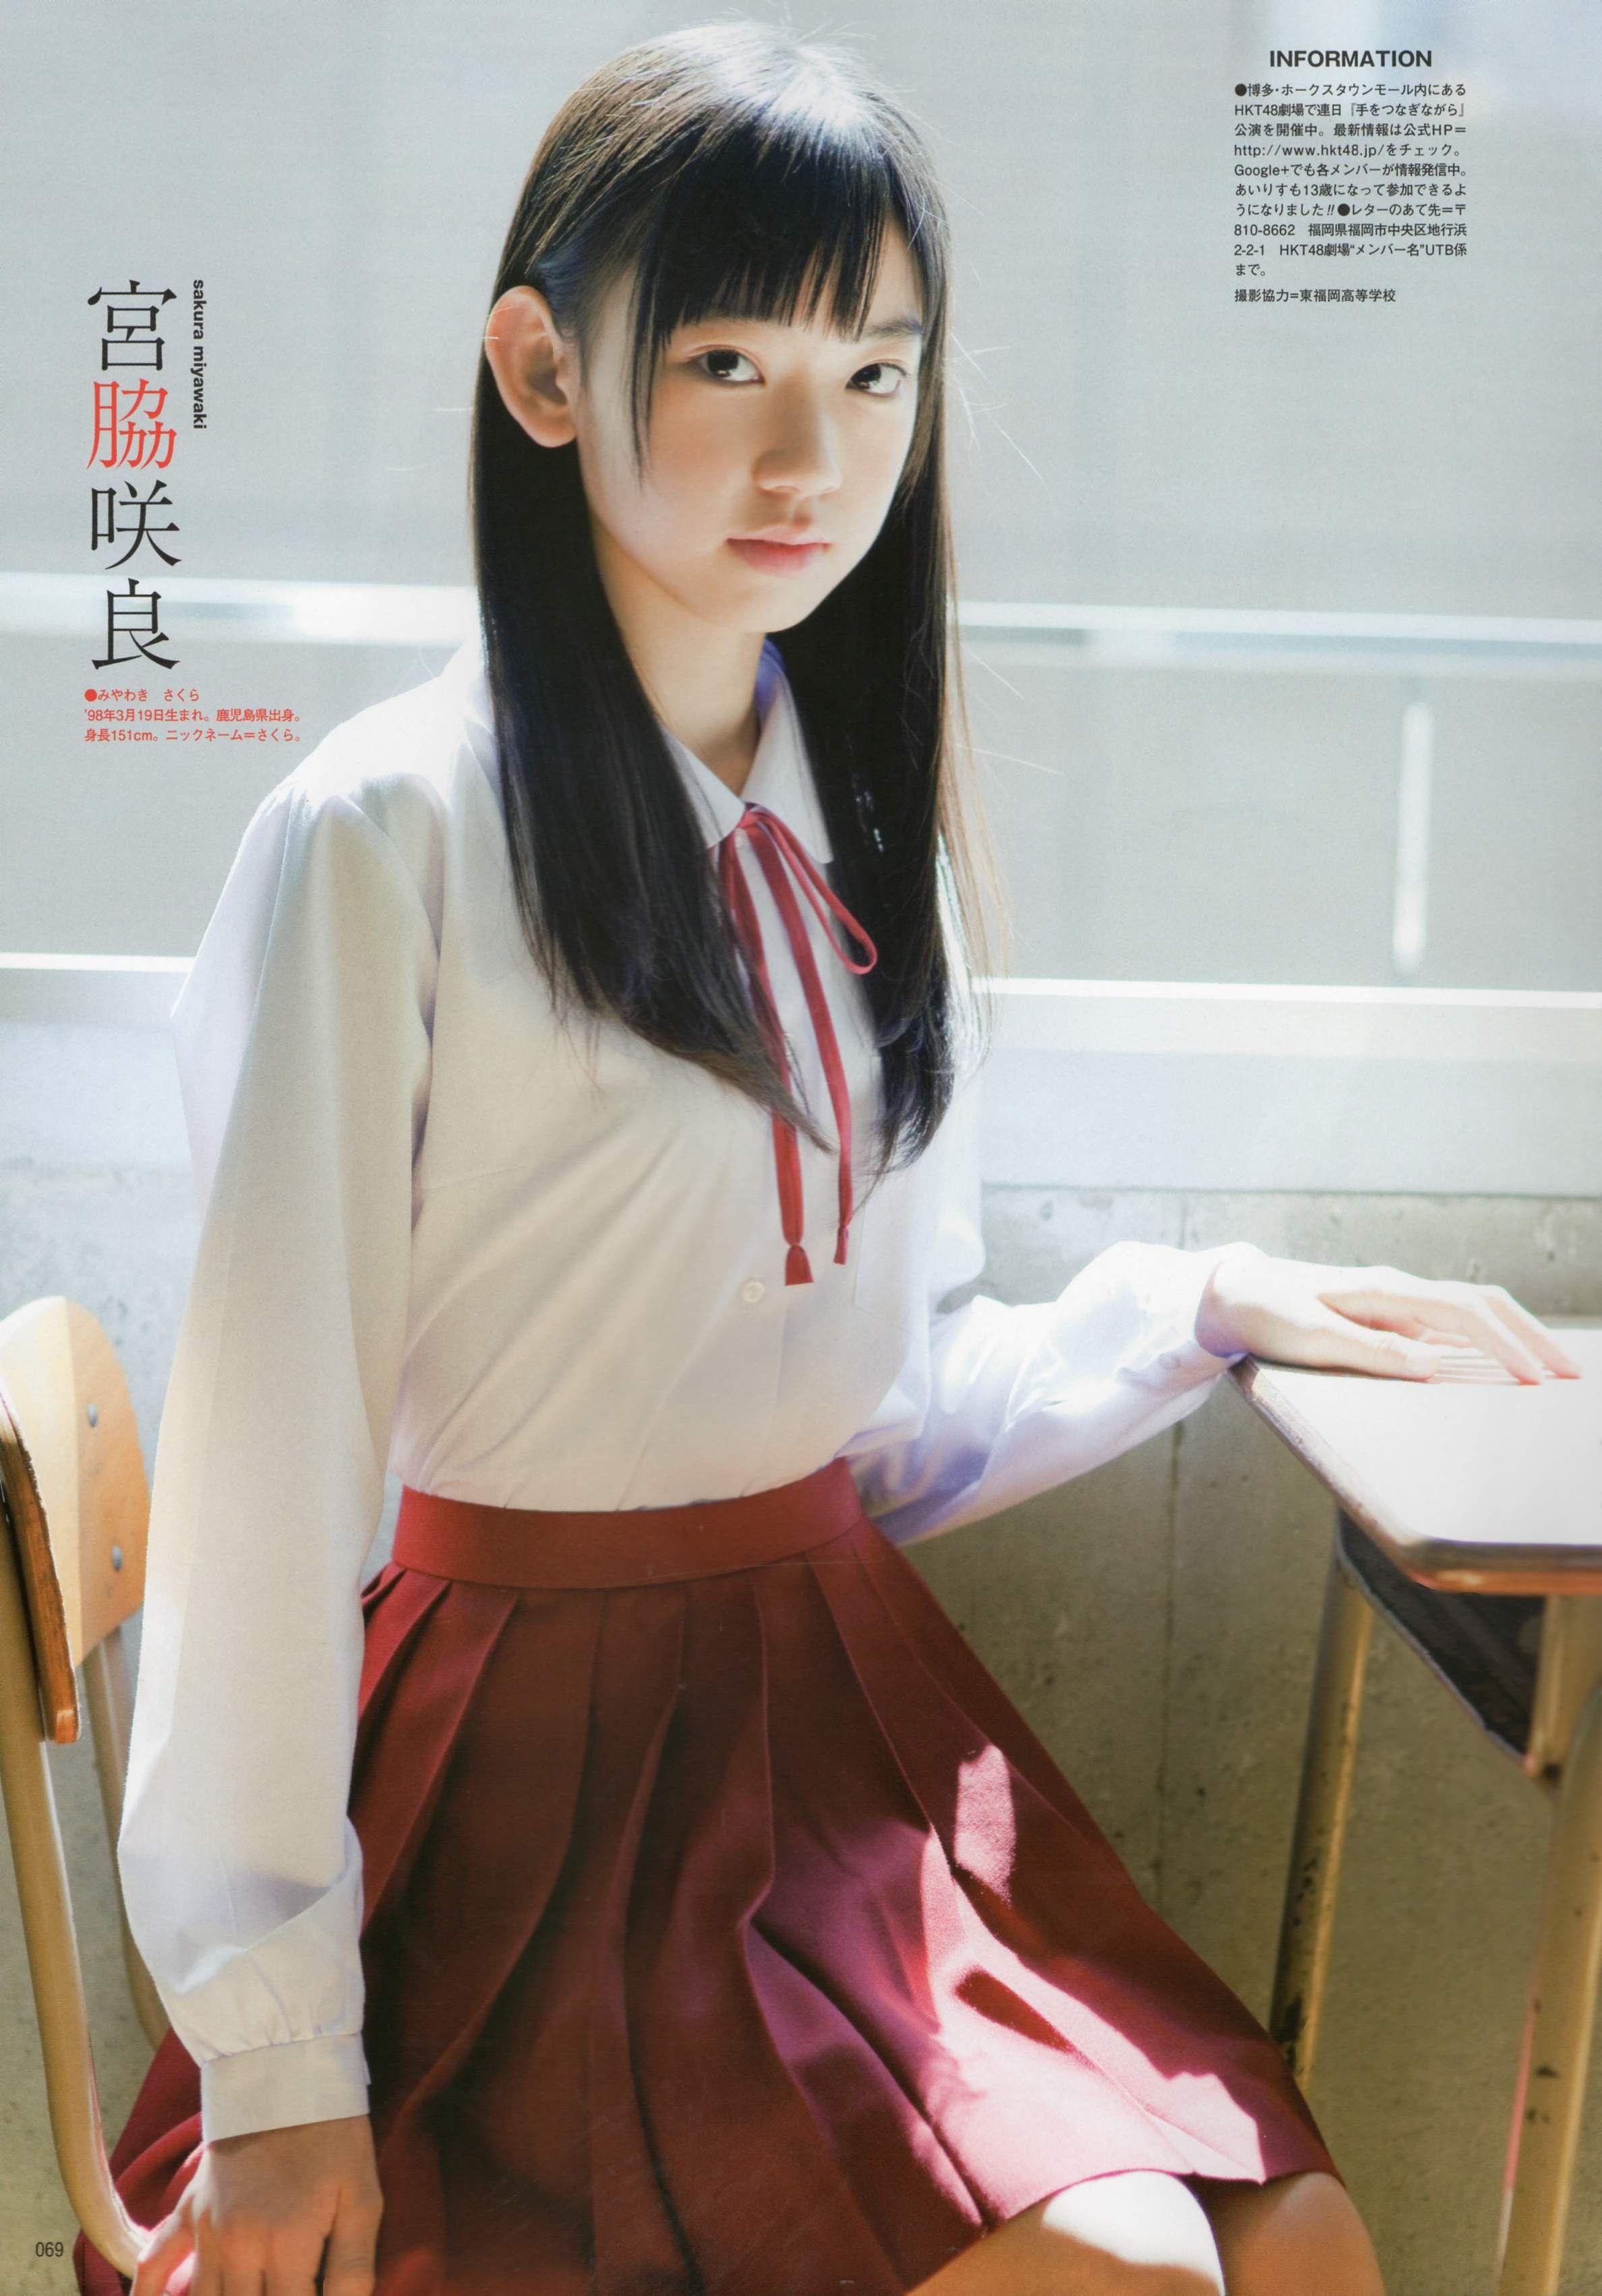 School girl dating japan